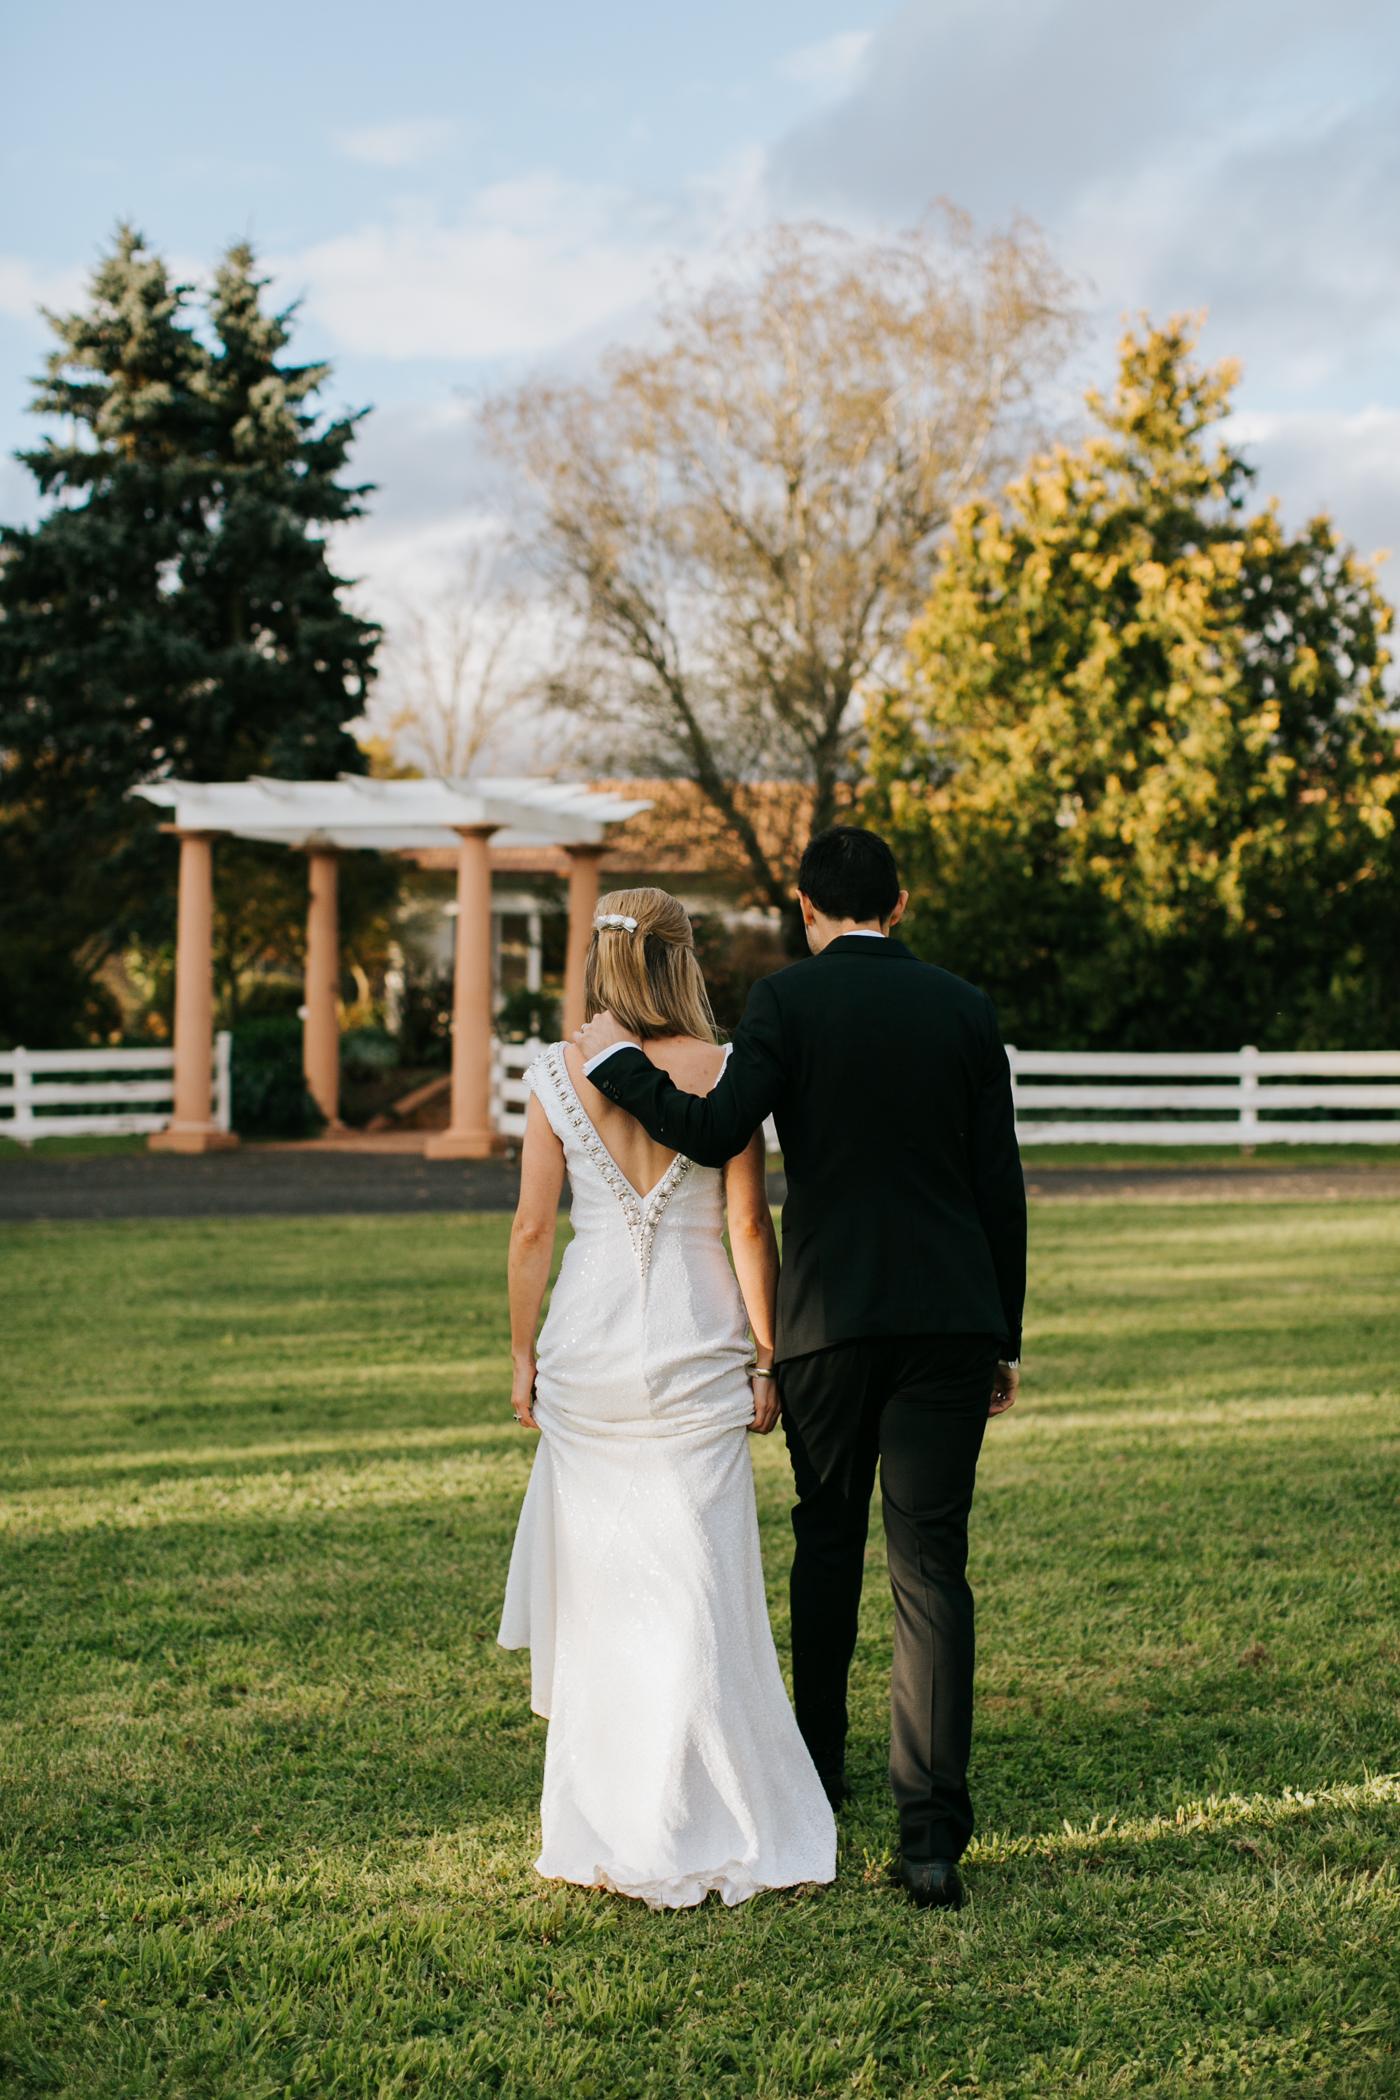 Bridget & James - Orange Country Wedding - Samantha Heather Photography-162.jpg